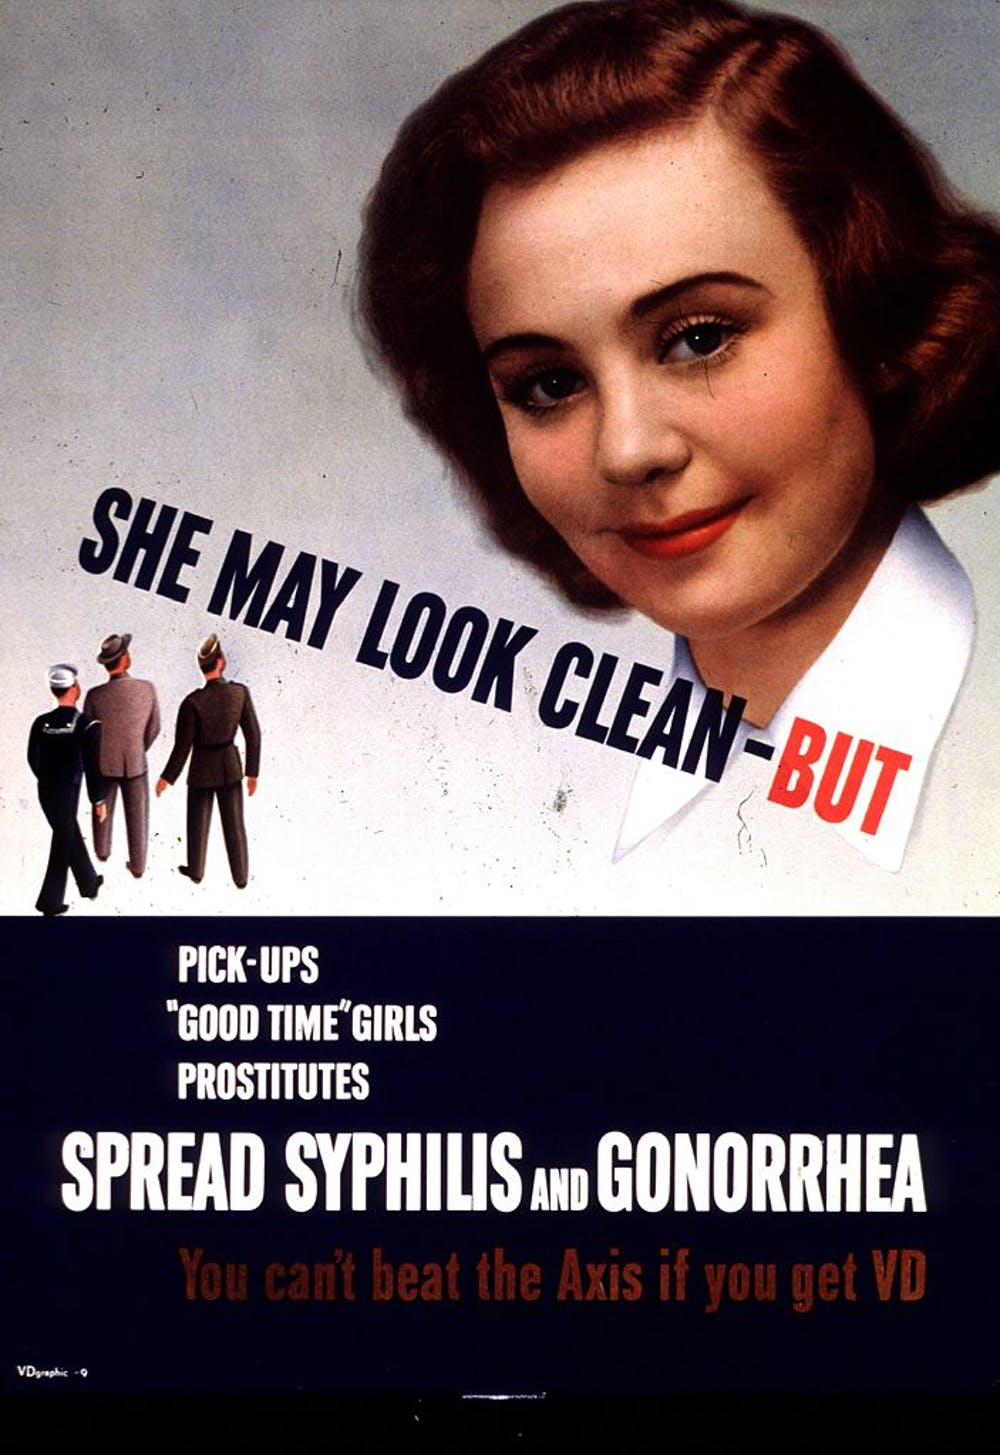 How World War II spurred vaccine innovation